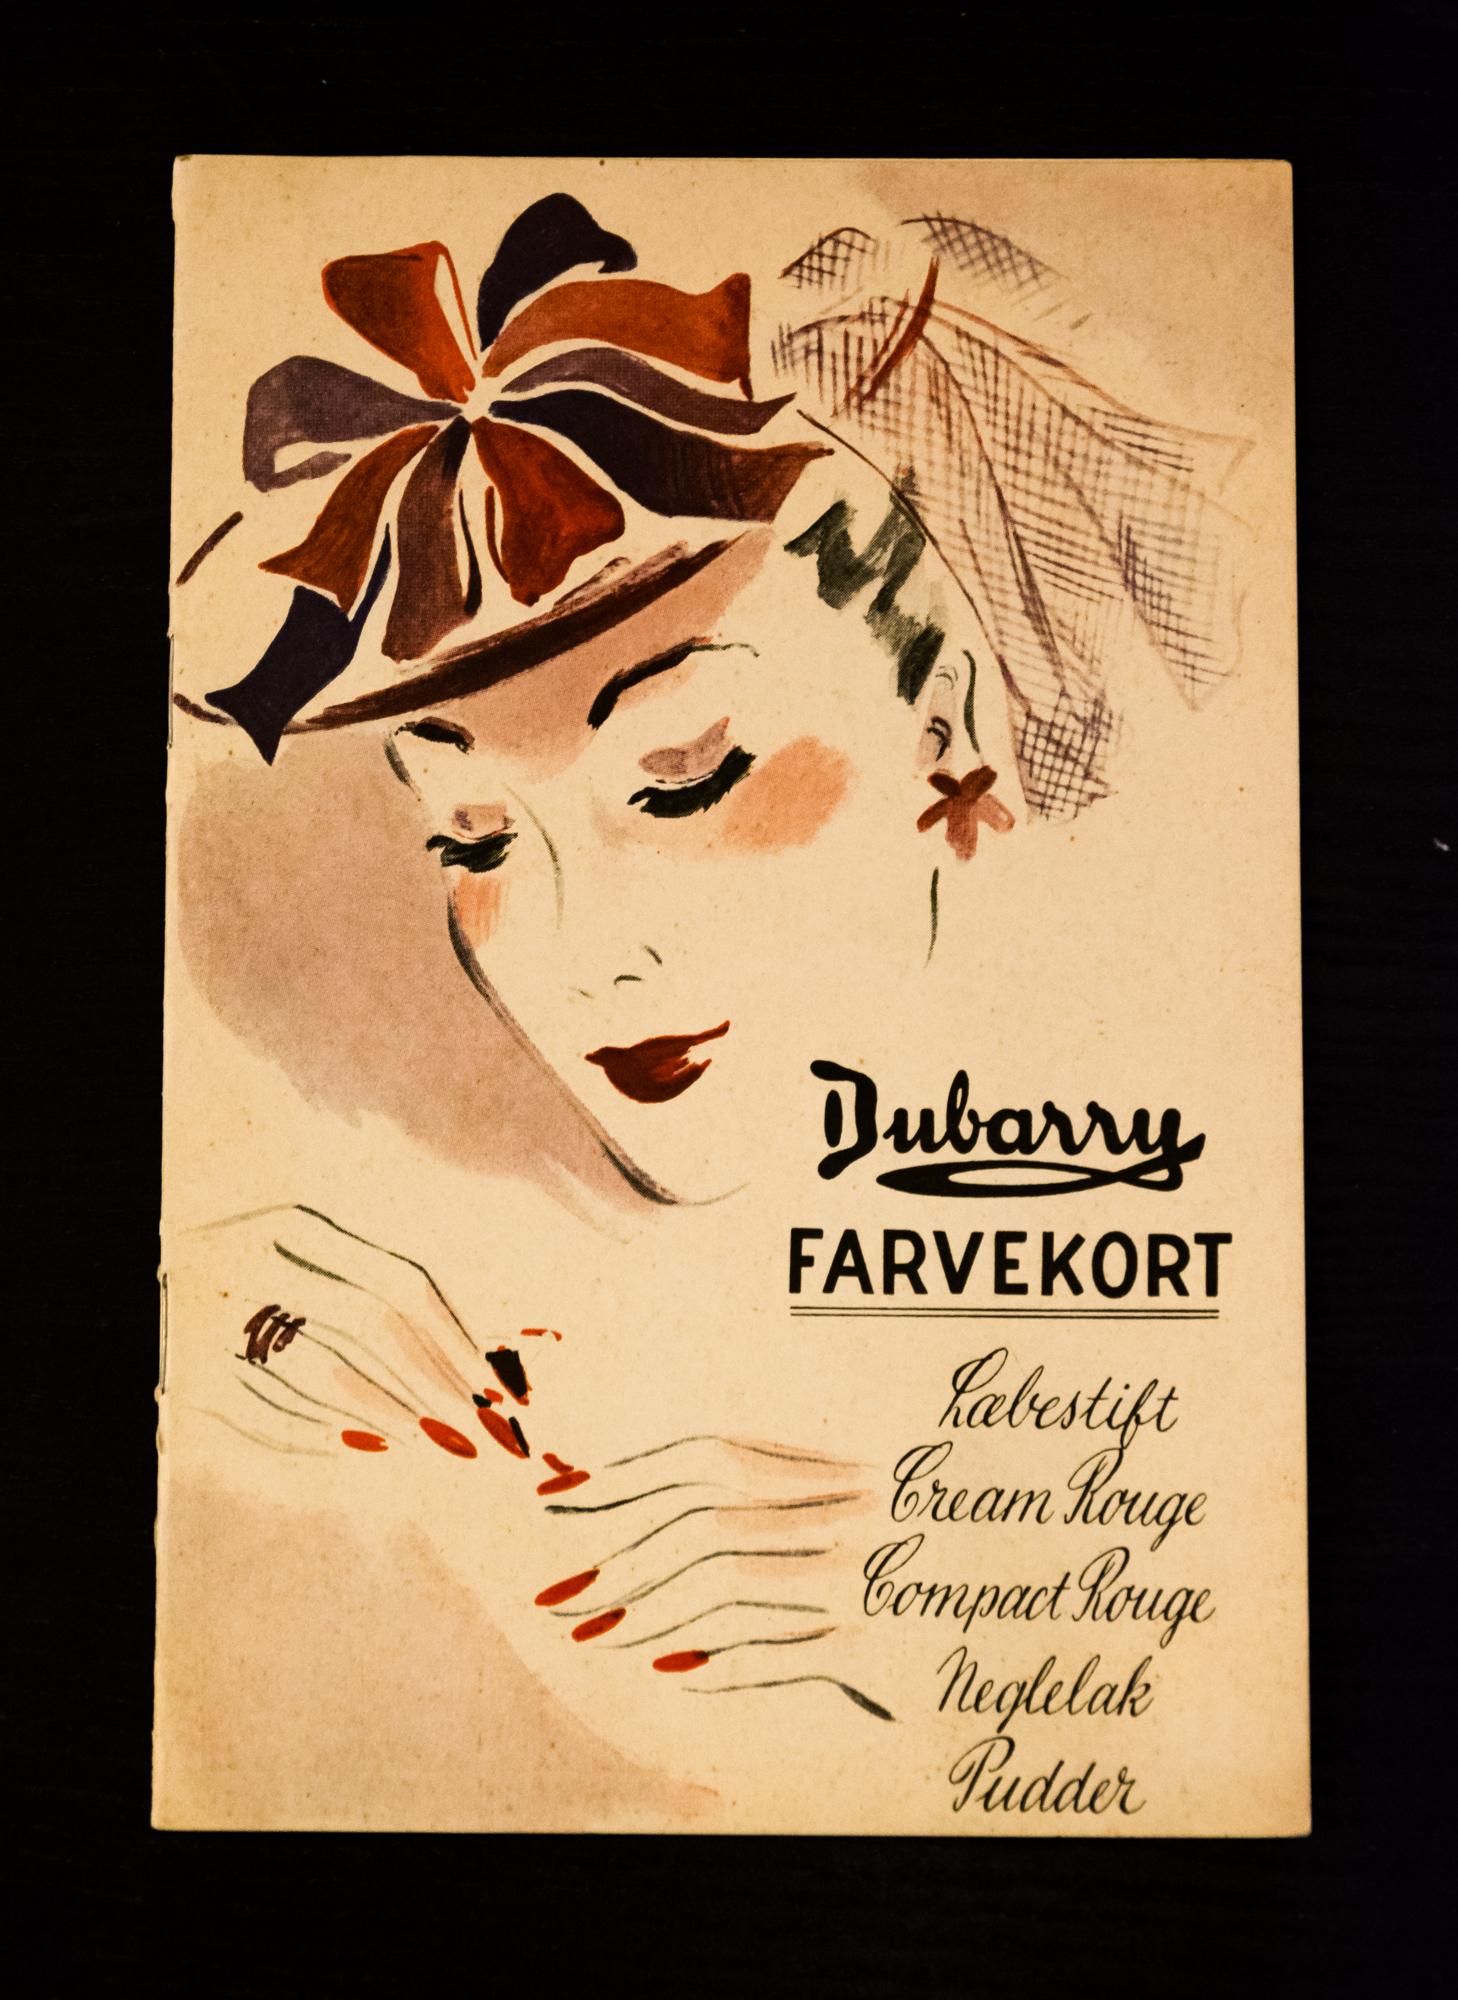 Dubarry Farvekort